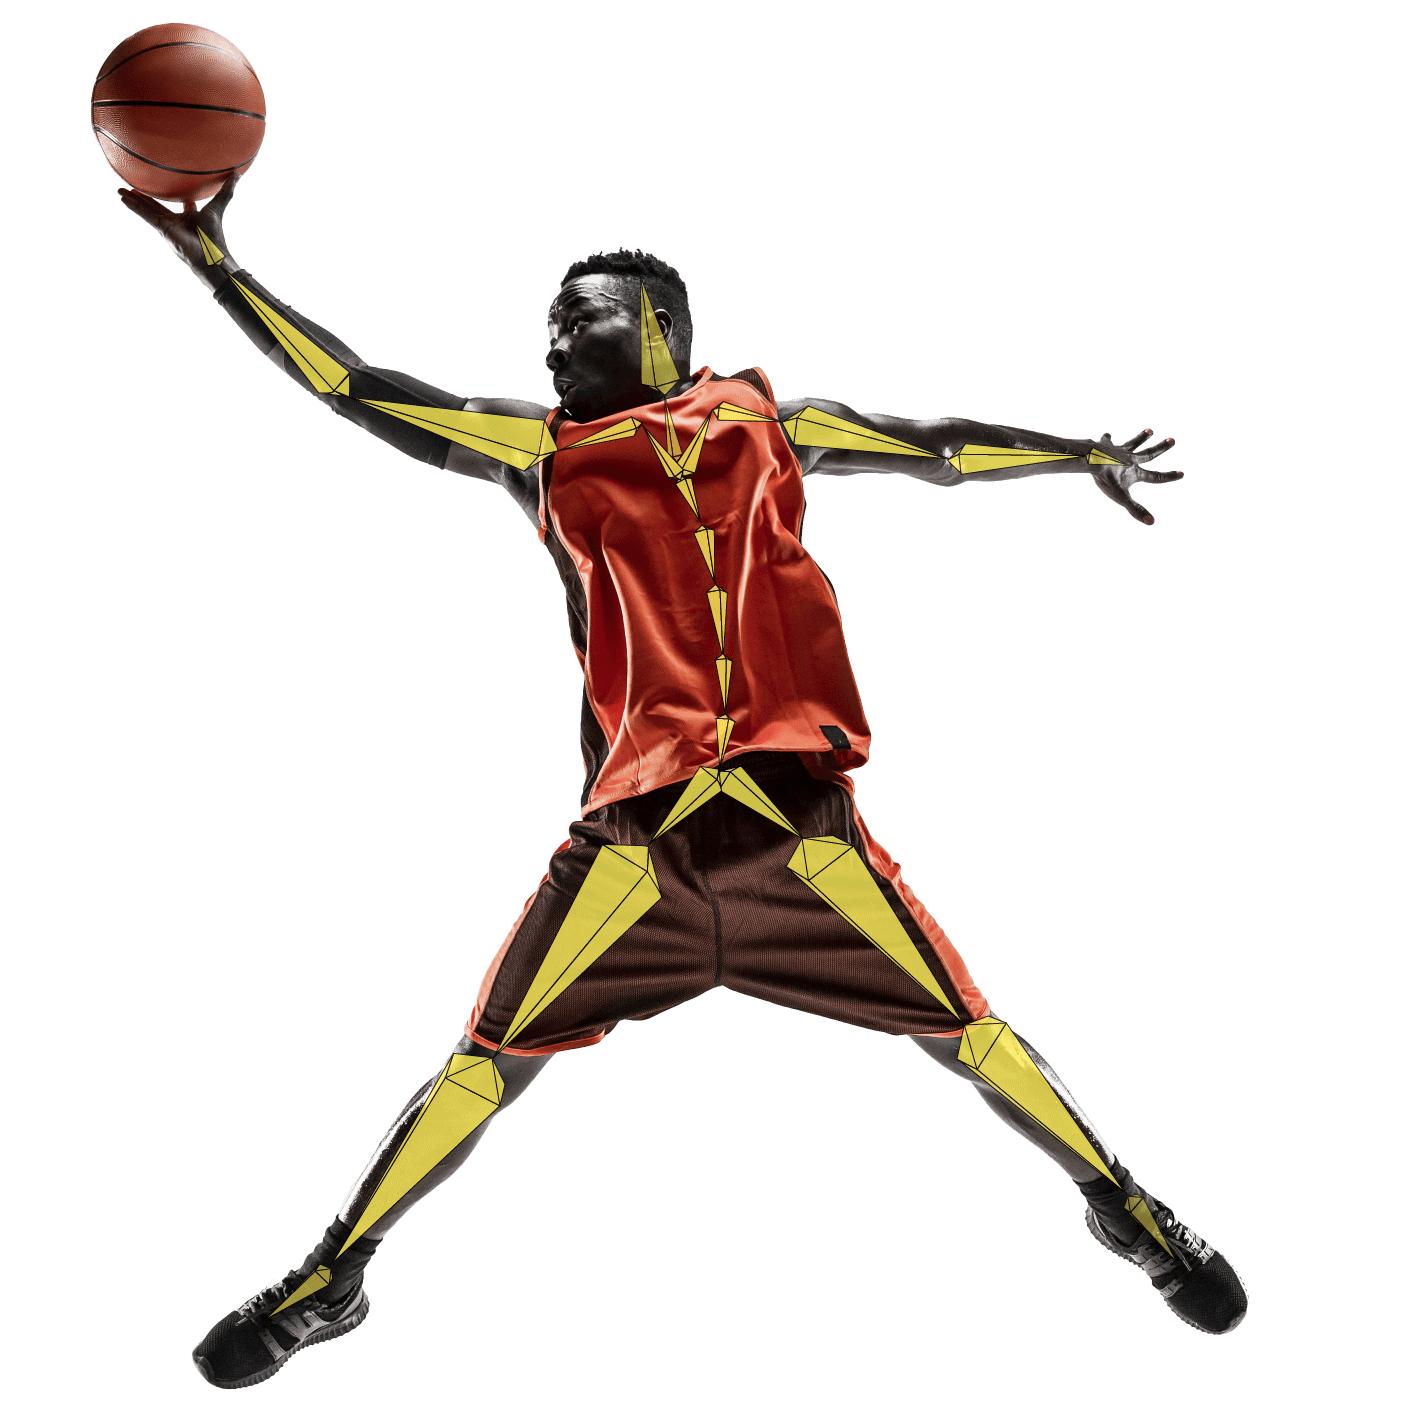 basketball_mocap_skeleton